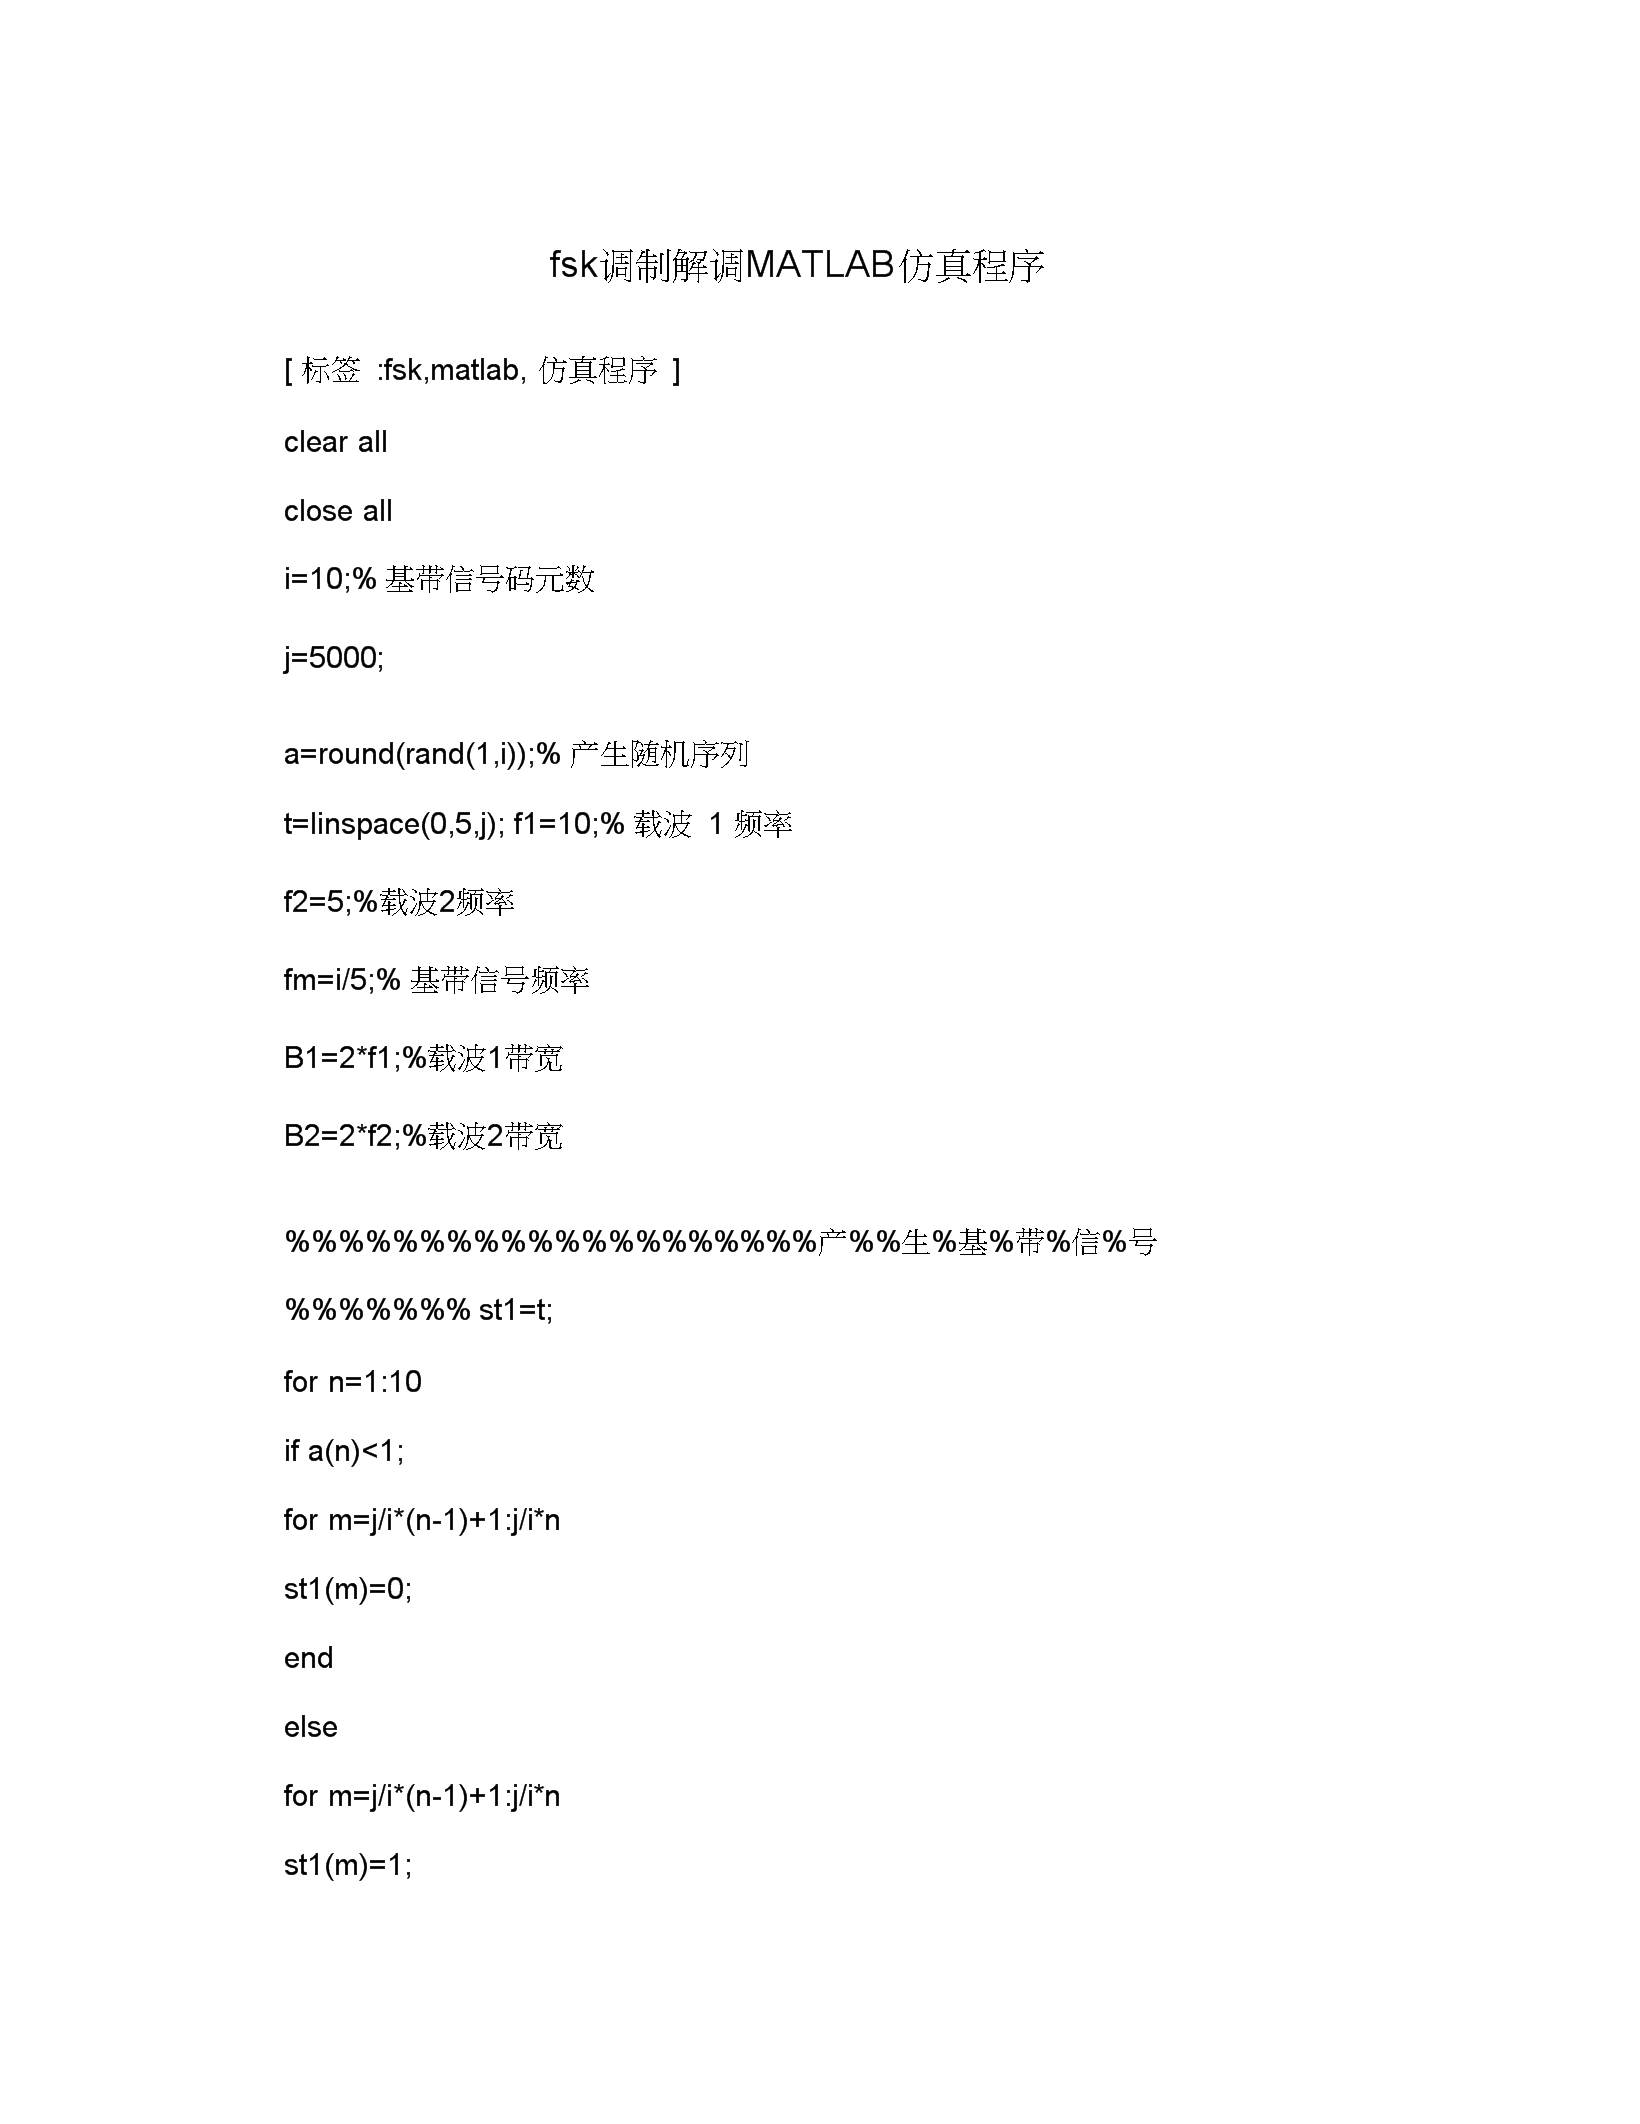 fsk调制解调MATLAB仿真程序.docx